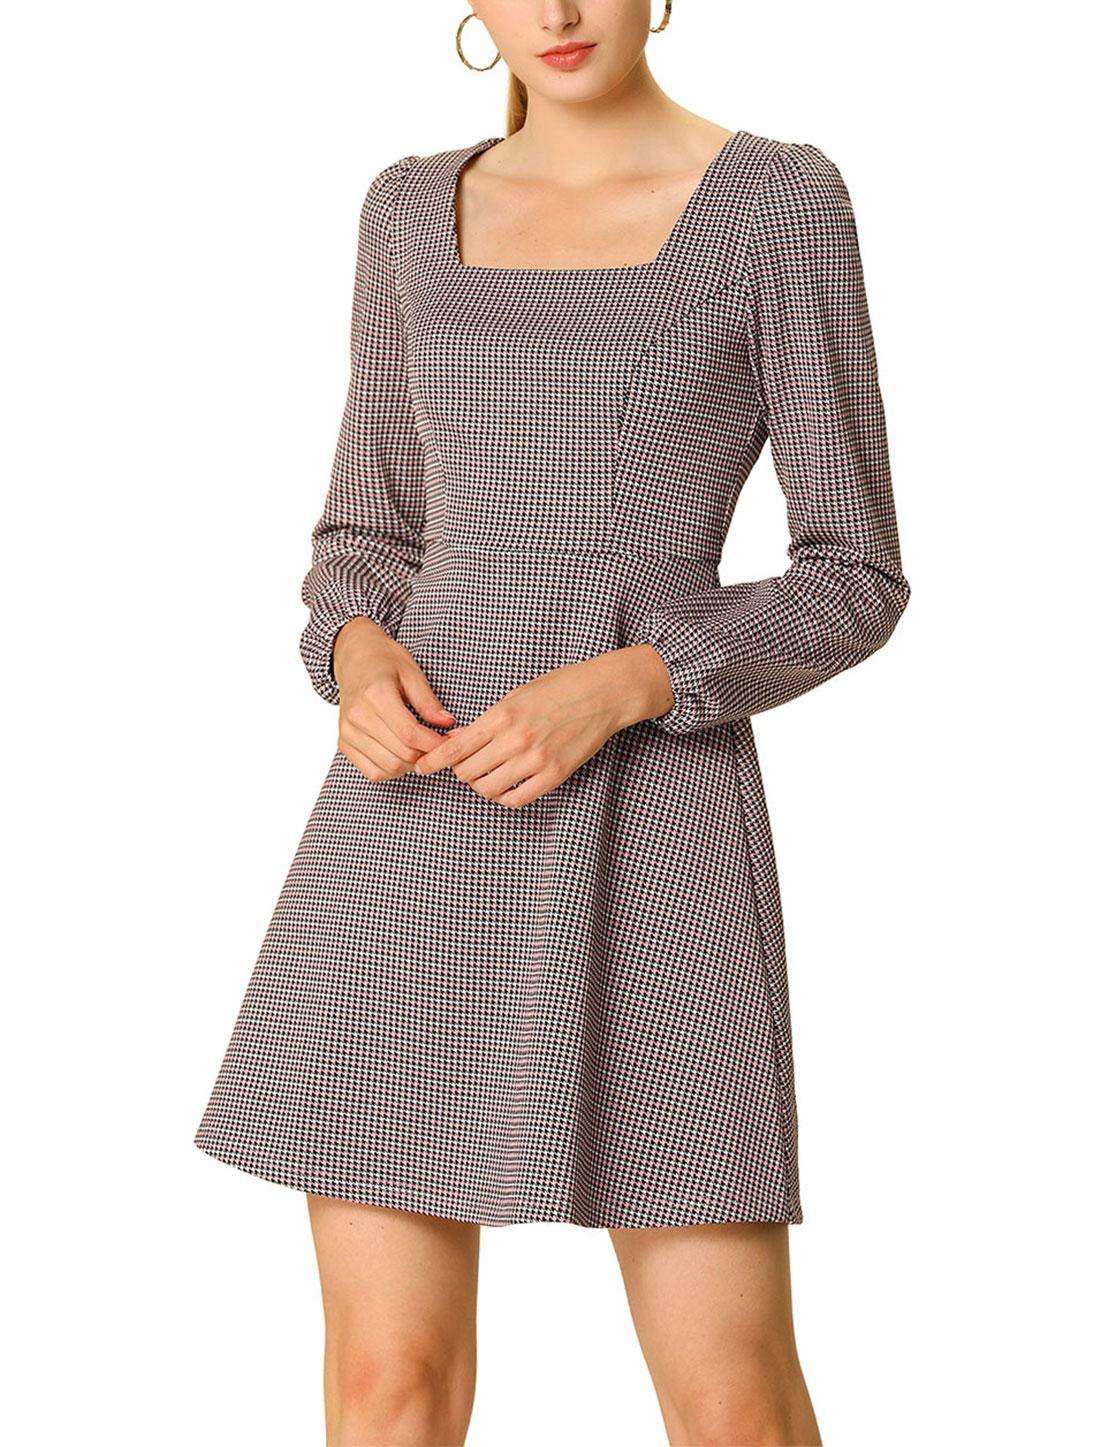 Allegra K Women's Fall Square Neck Vintage Mini Plaid Dress Pink S (US 6)